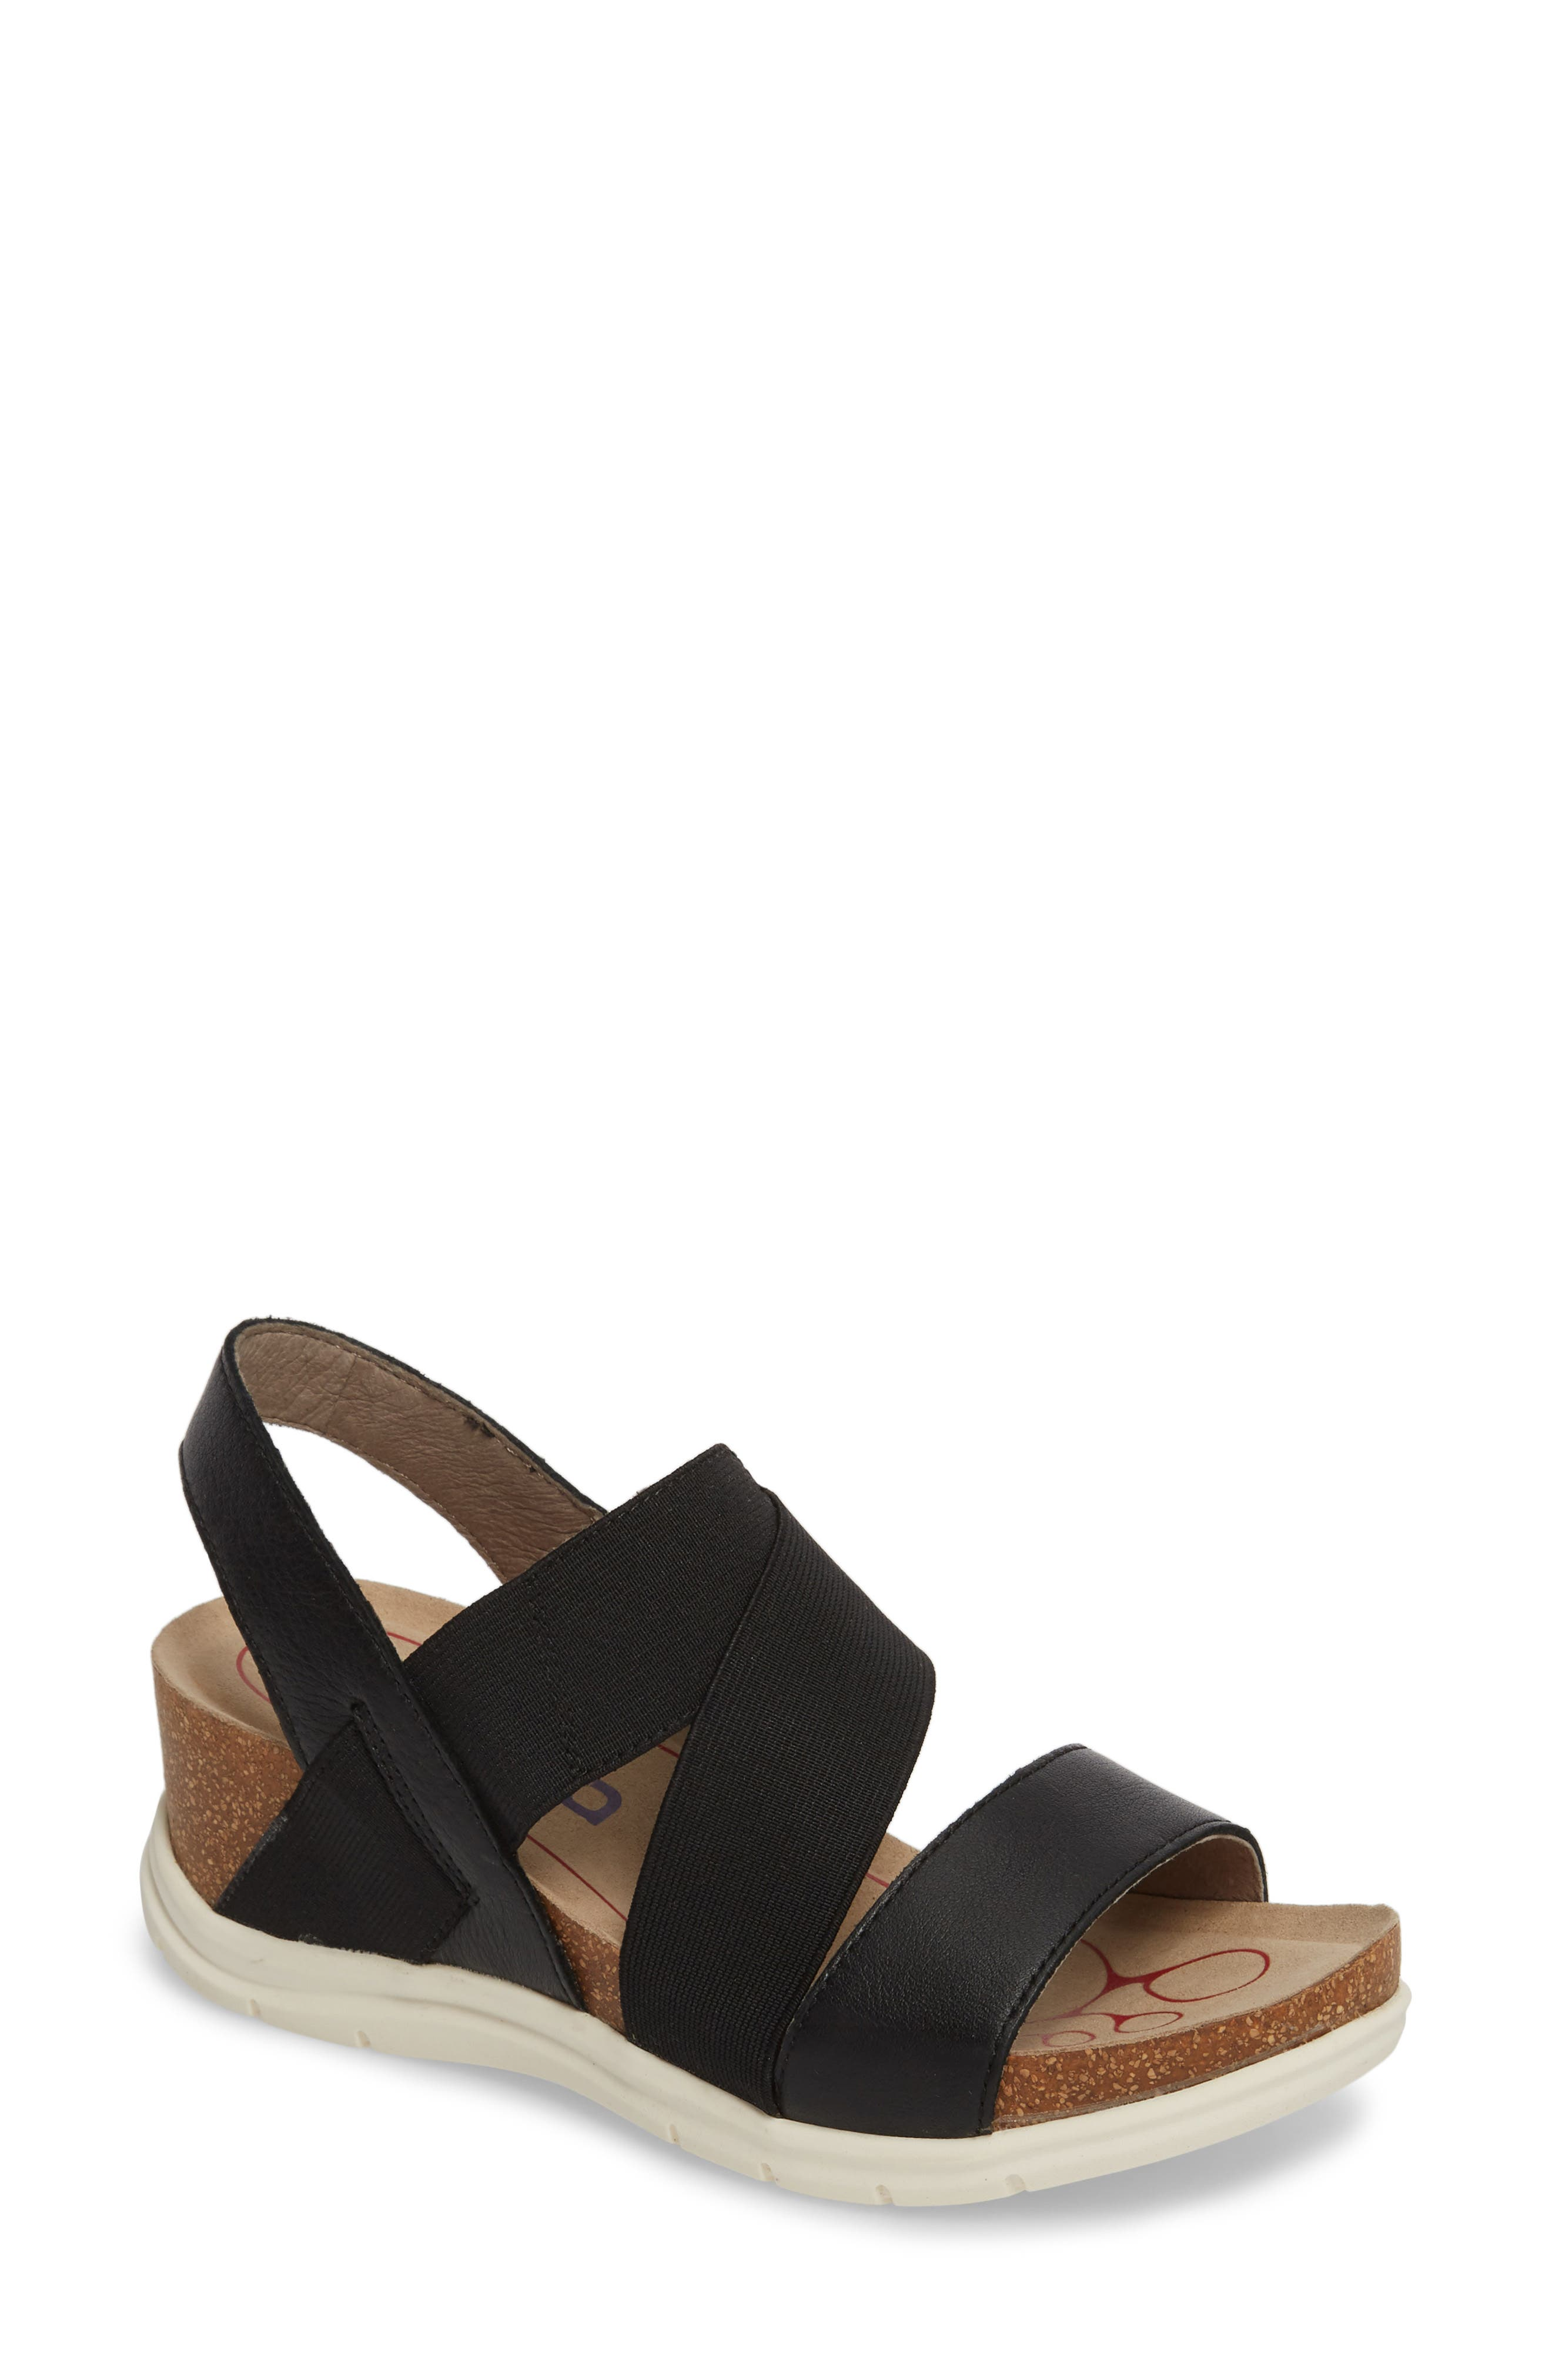 Paisley Wedge Sandal,                         Main,                         color, 001